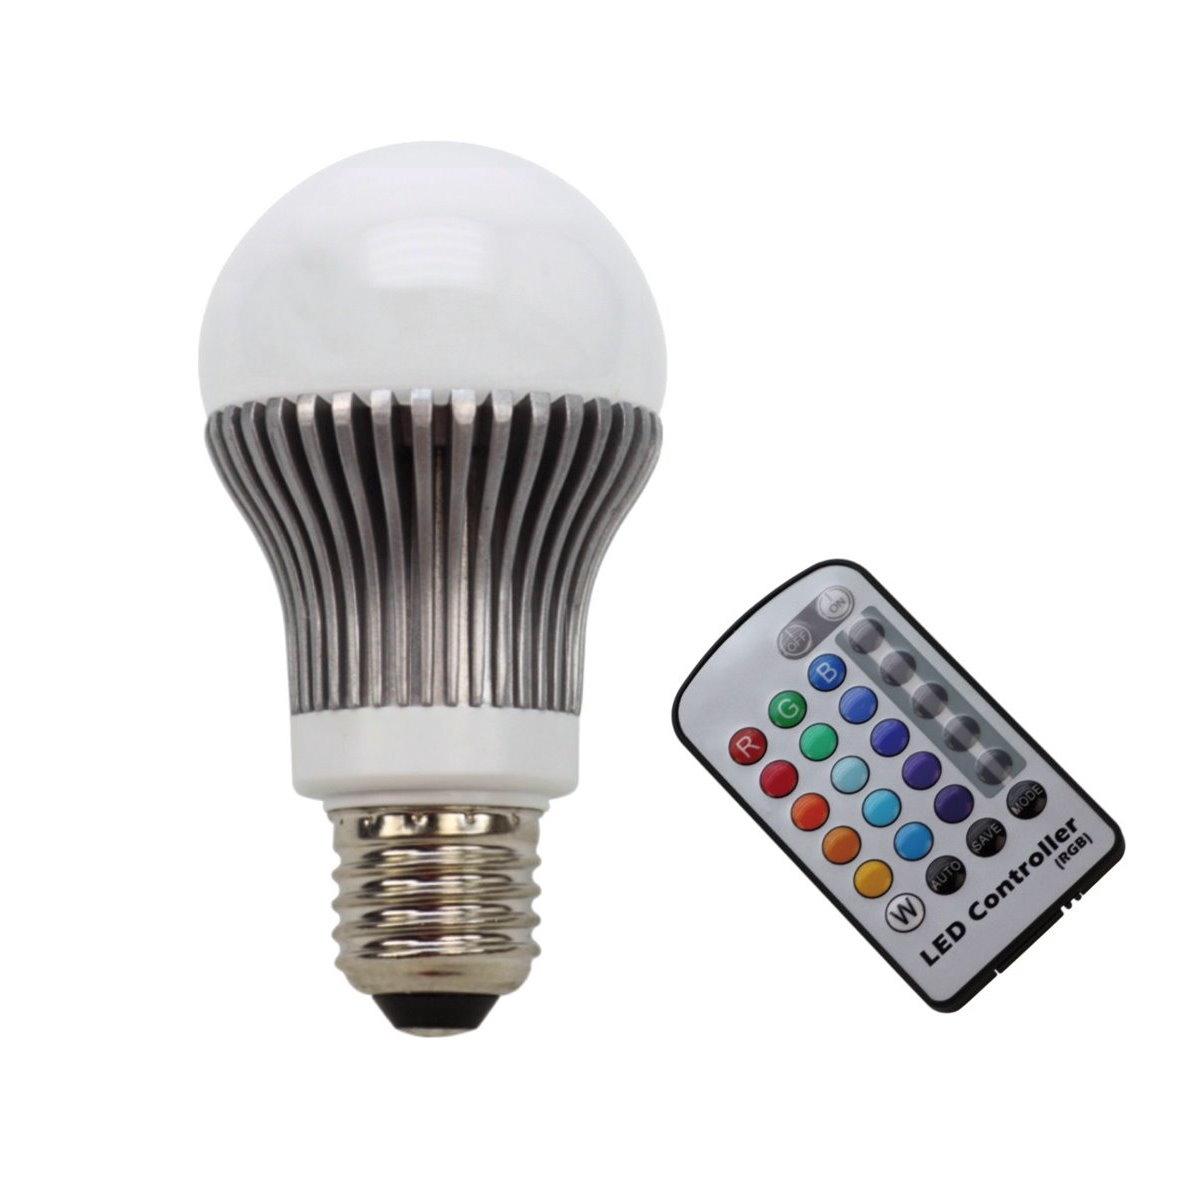 power led rgb leuchtmittel farbwechsel strahler reflektor cob remote licht lampe ebay. Black Bedroom Furniture Sets. Home Design Ideas